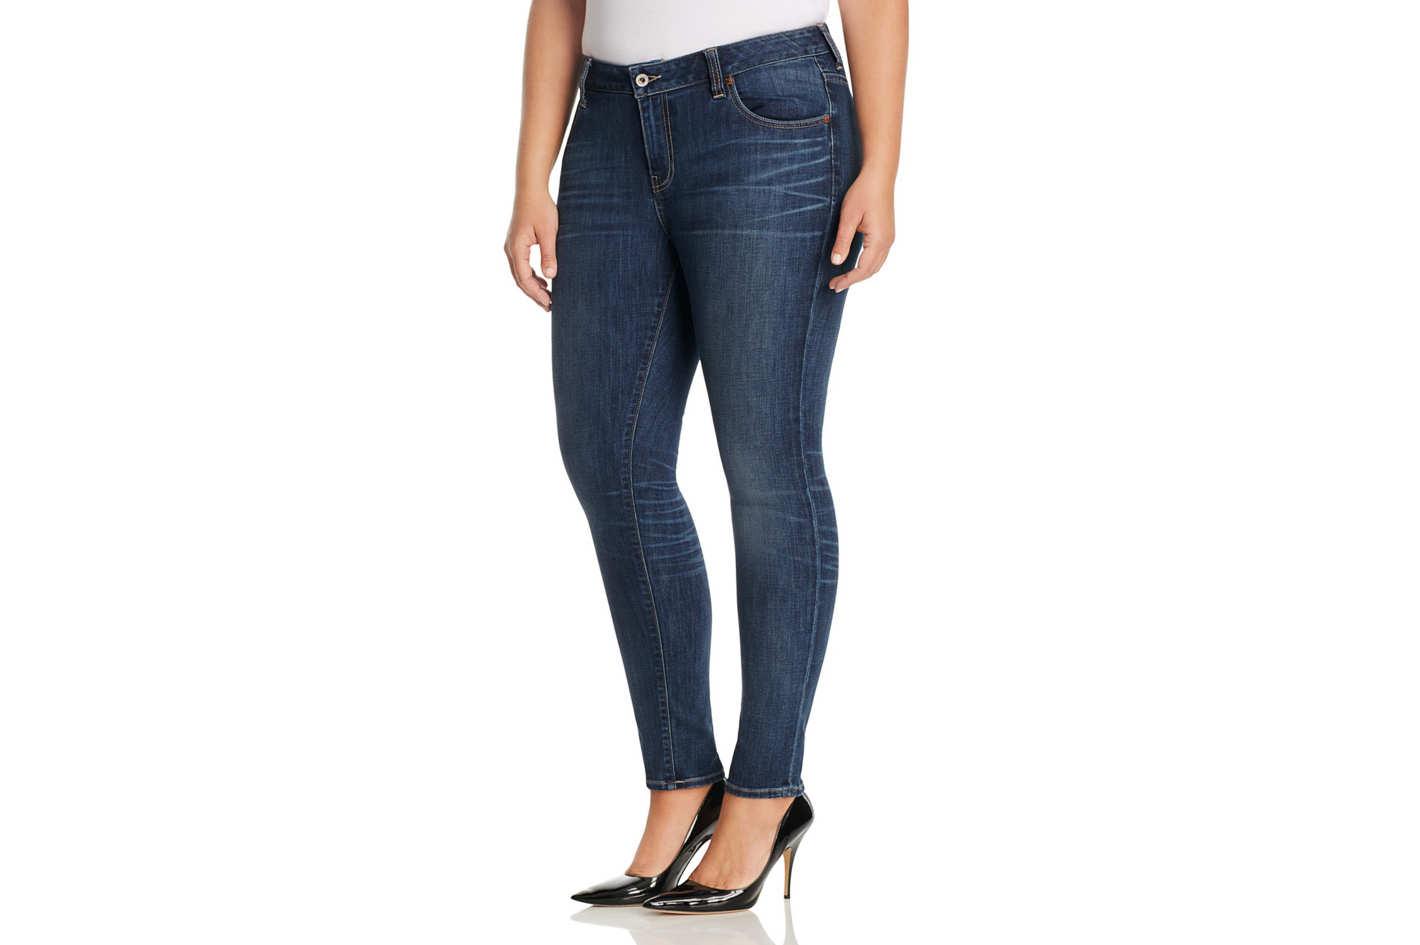 Skinny Jeans for Curvy Women